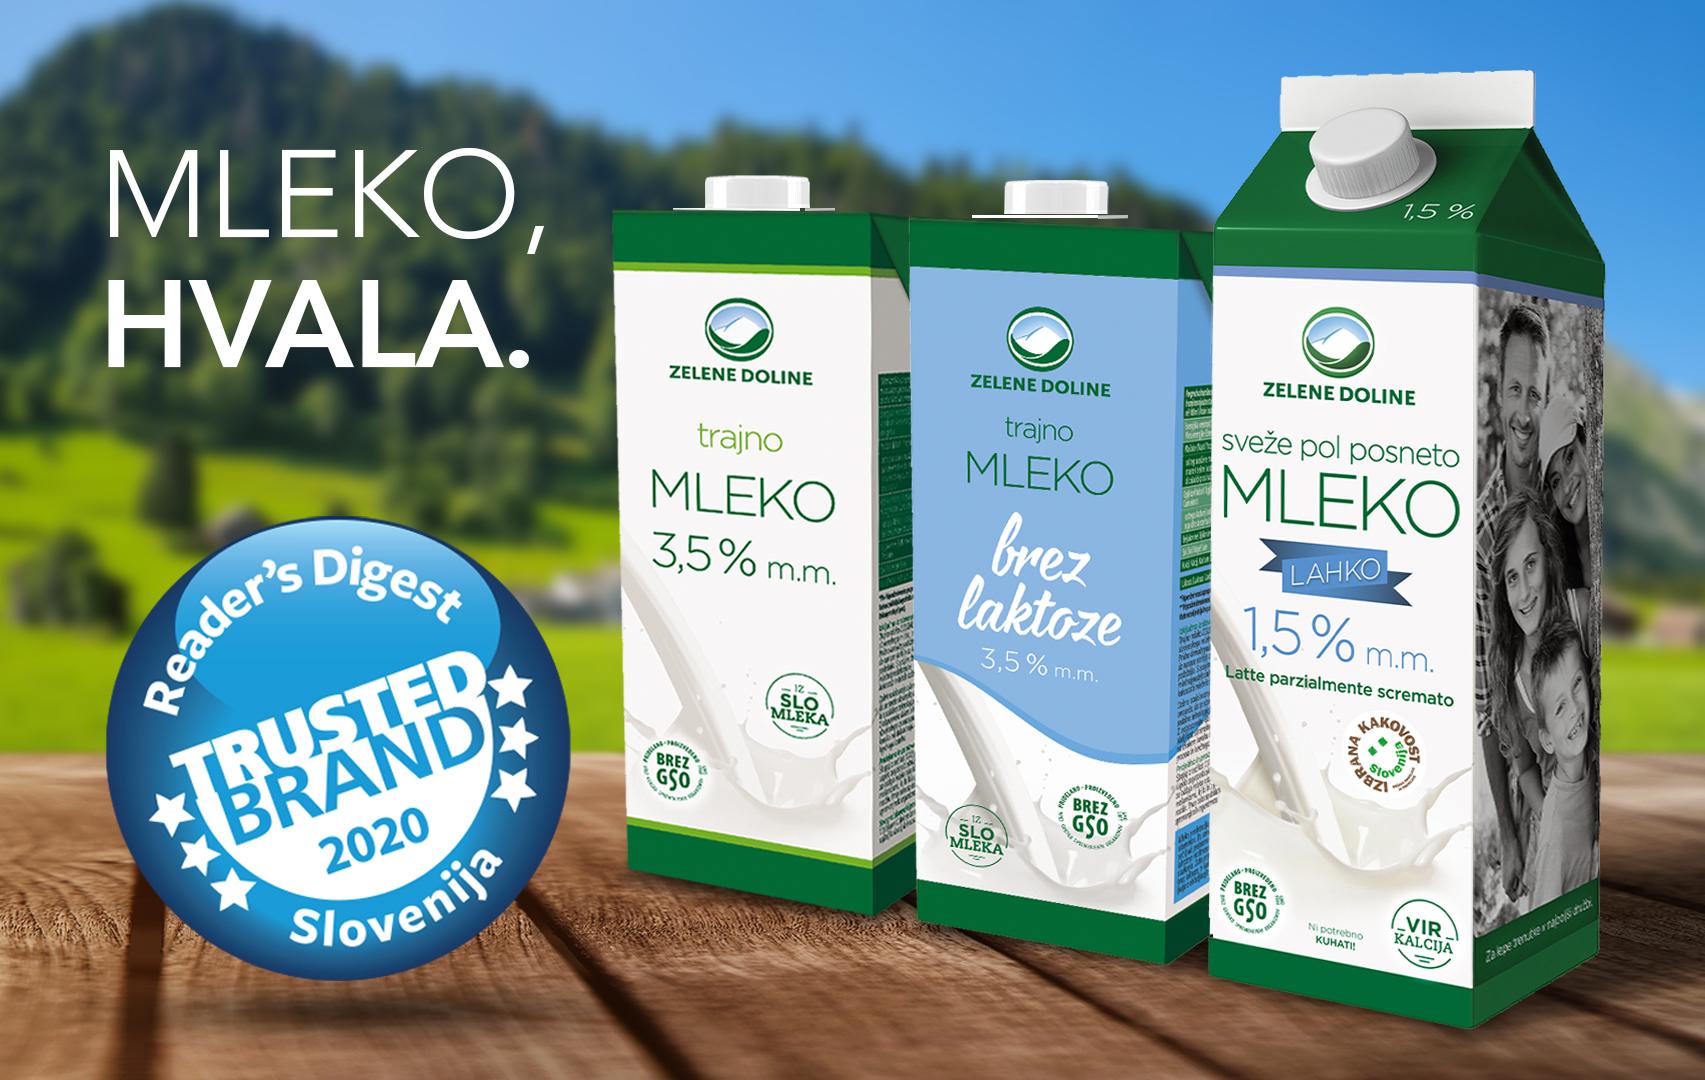 mleko_zelene_doline_rgb